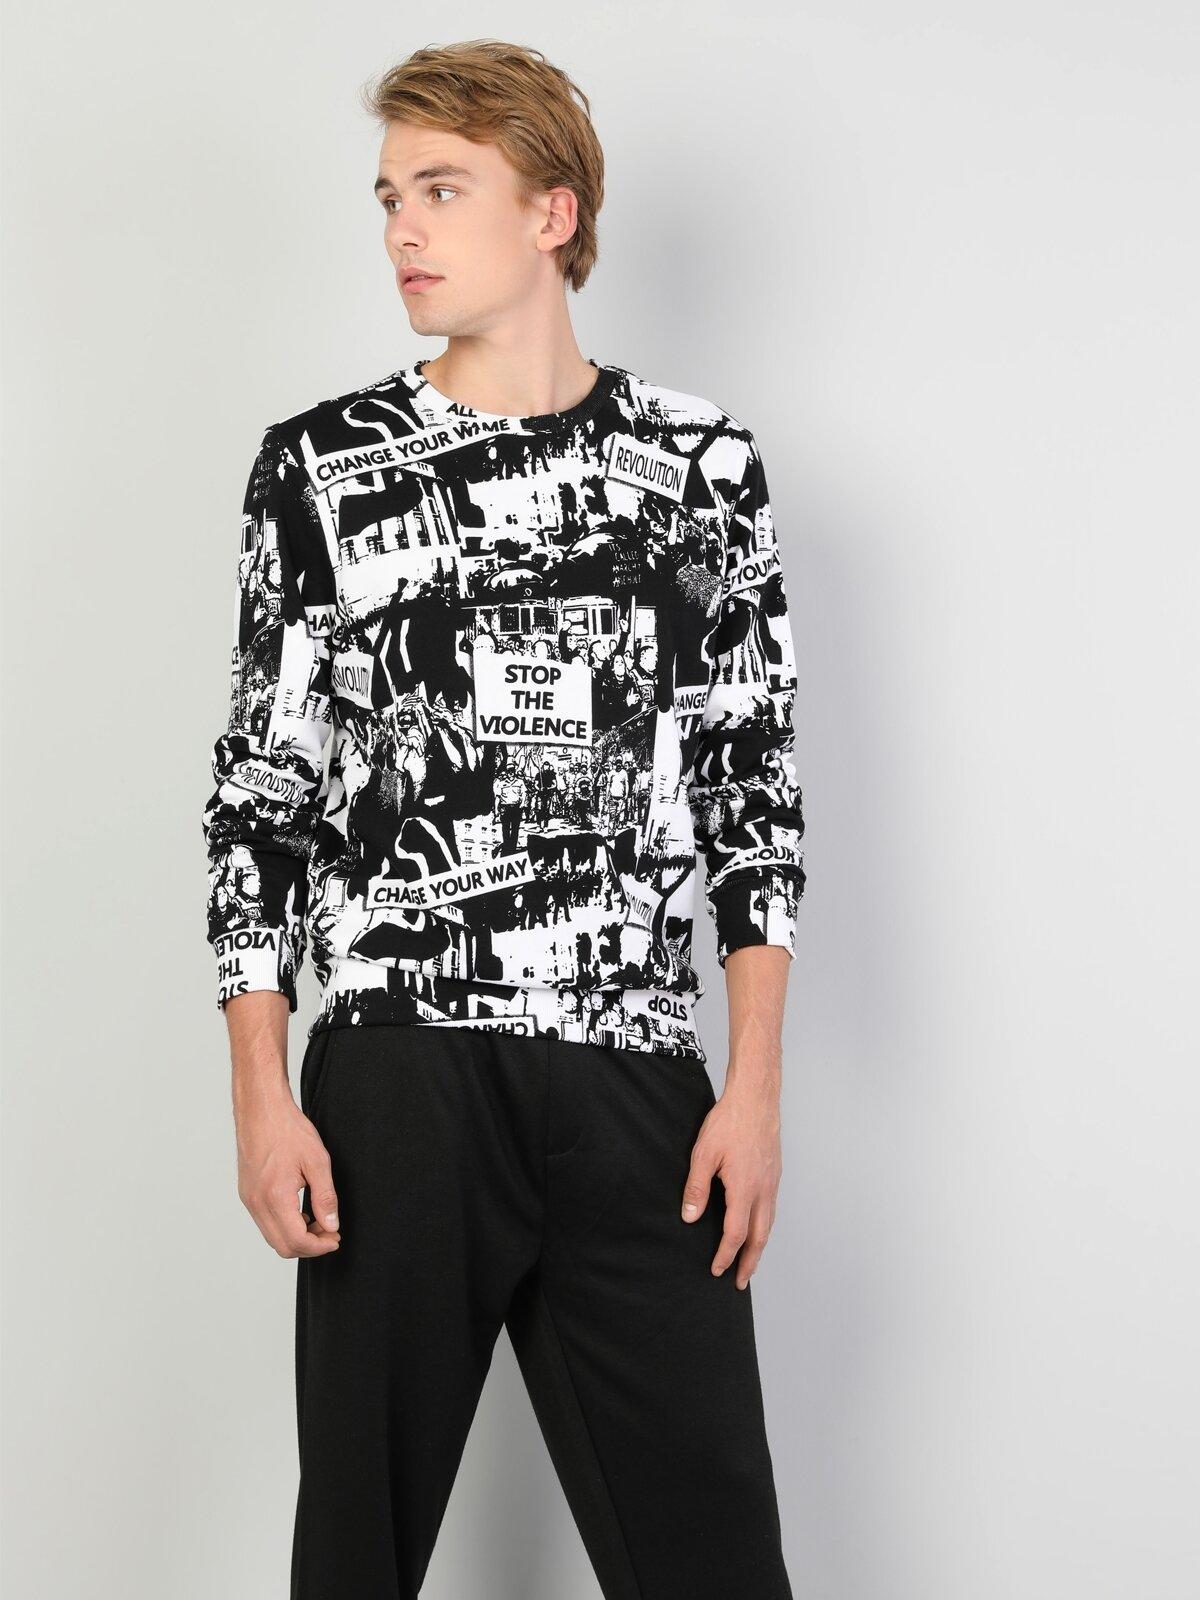 Regular Fit Erkek Baskılı Siyah Sweatshirt